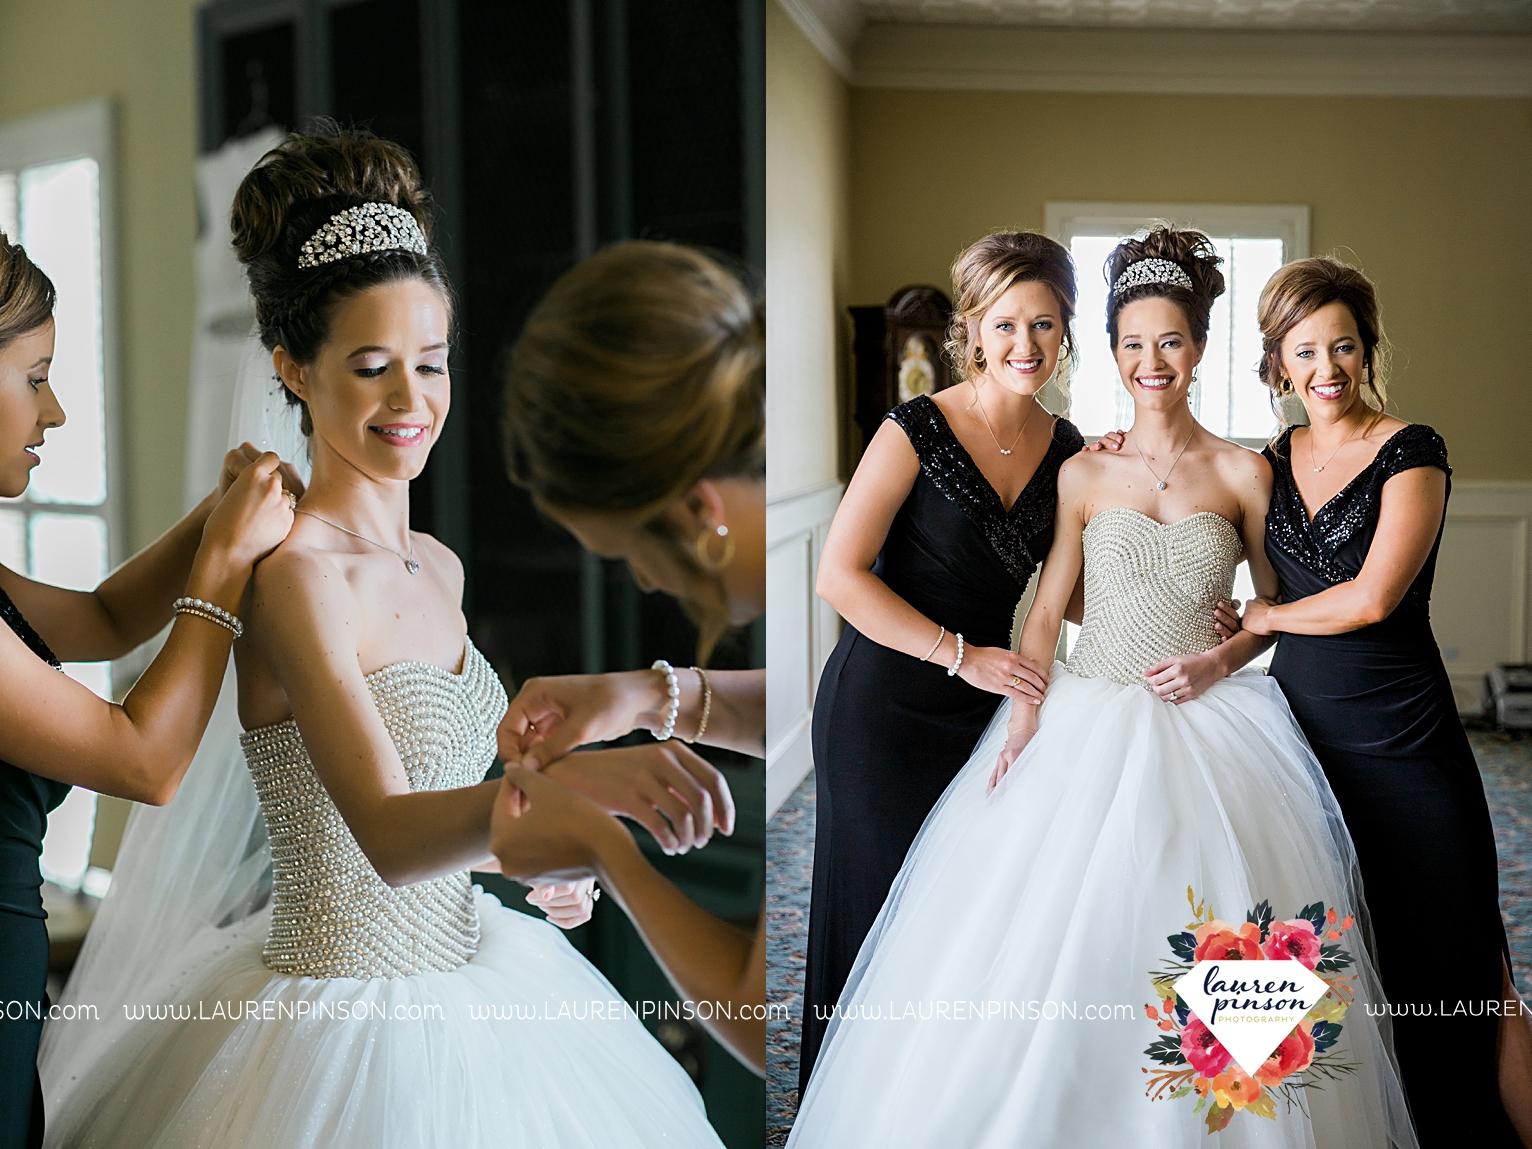 wichita-falls-texas-wedding-photographer-the-forum-by-the-kemp-mayfield-events-ulta-gold-glitter_2815.jpg